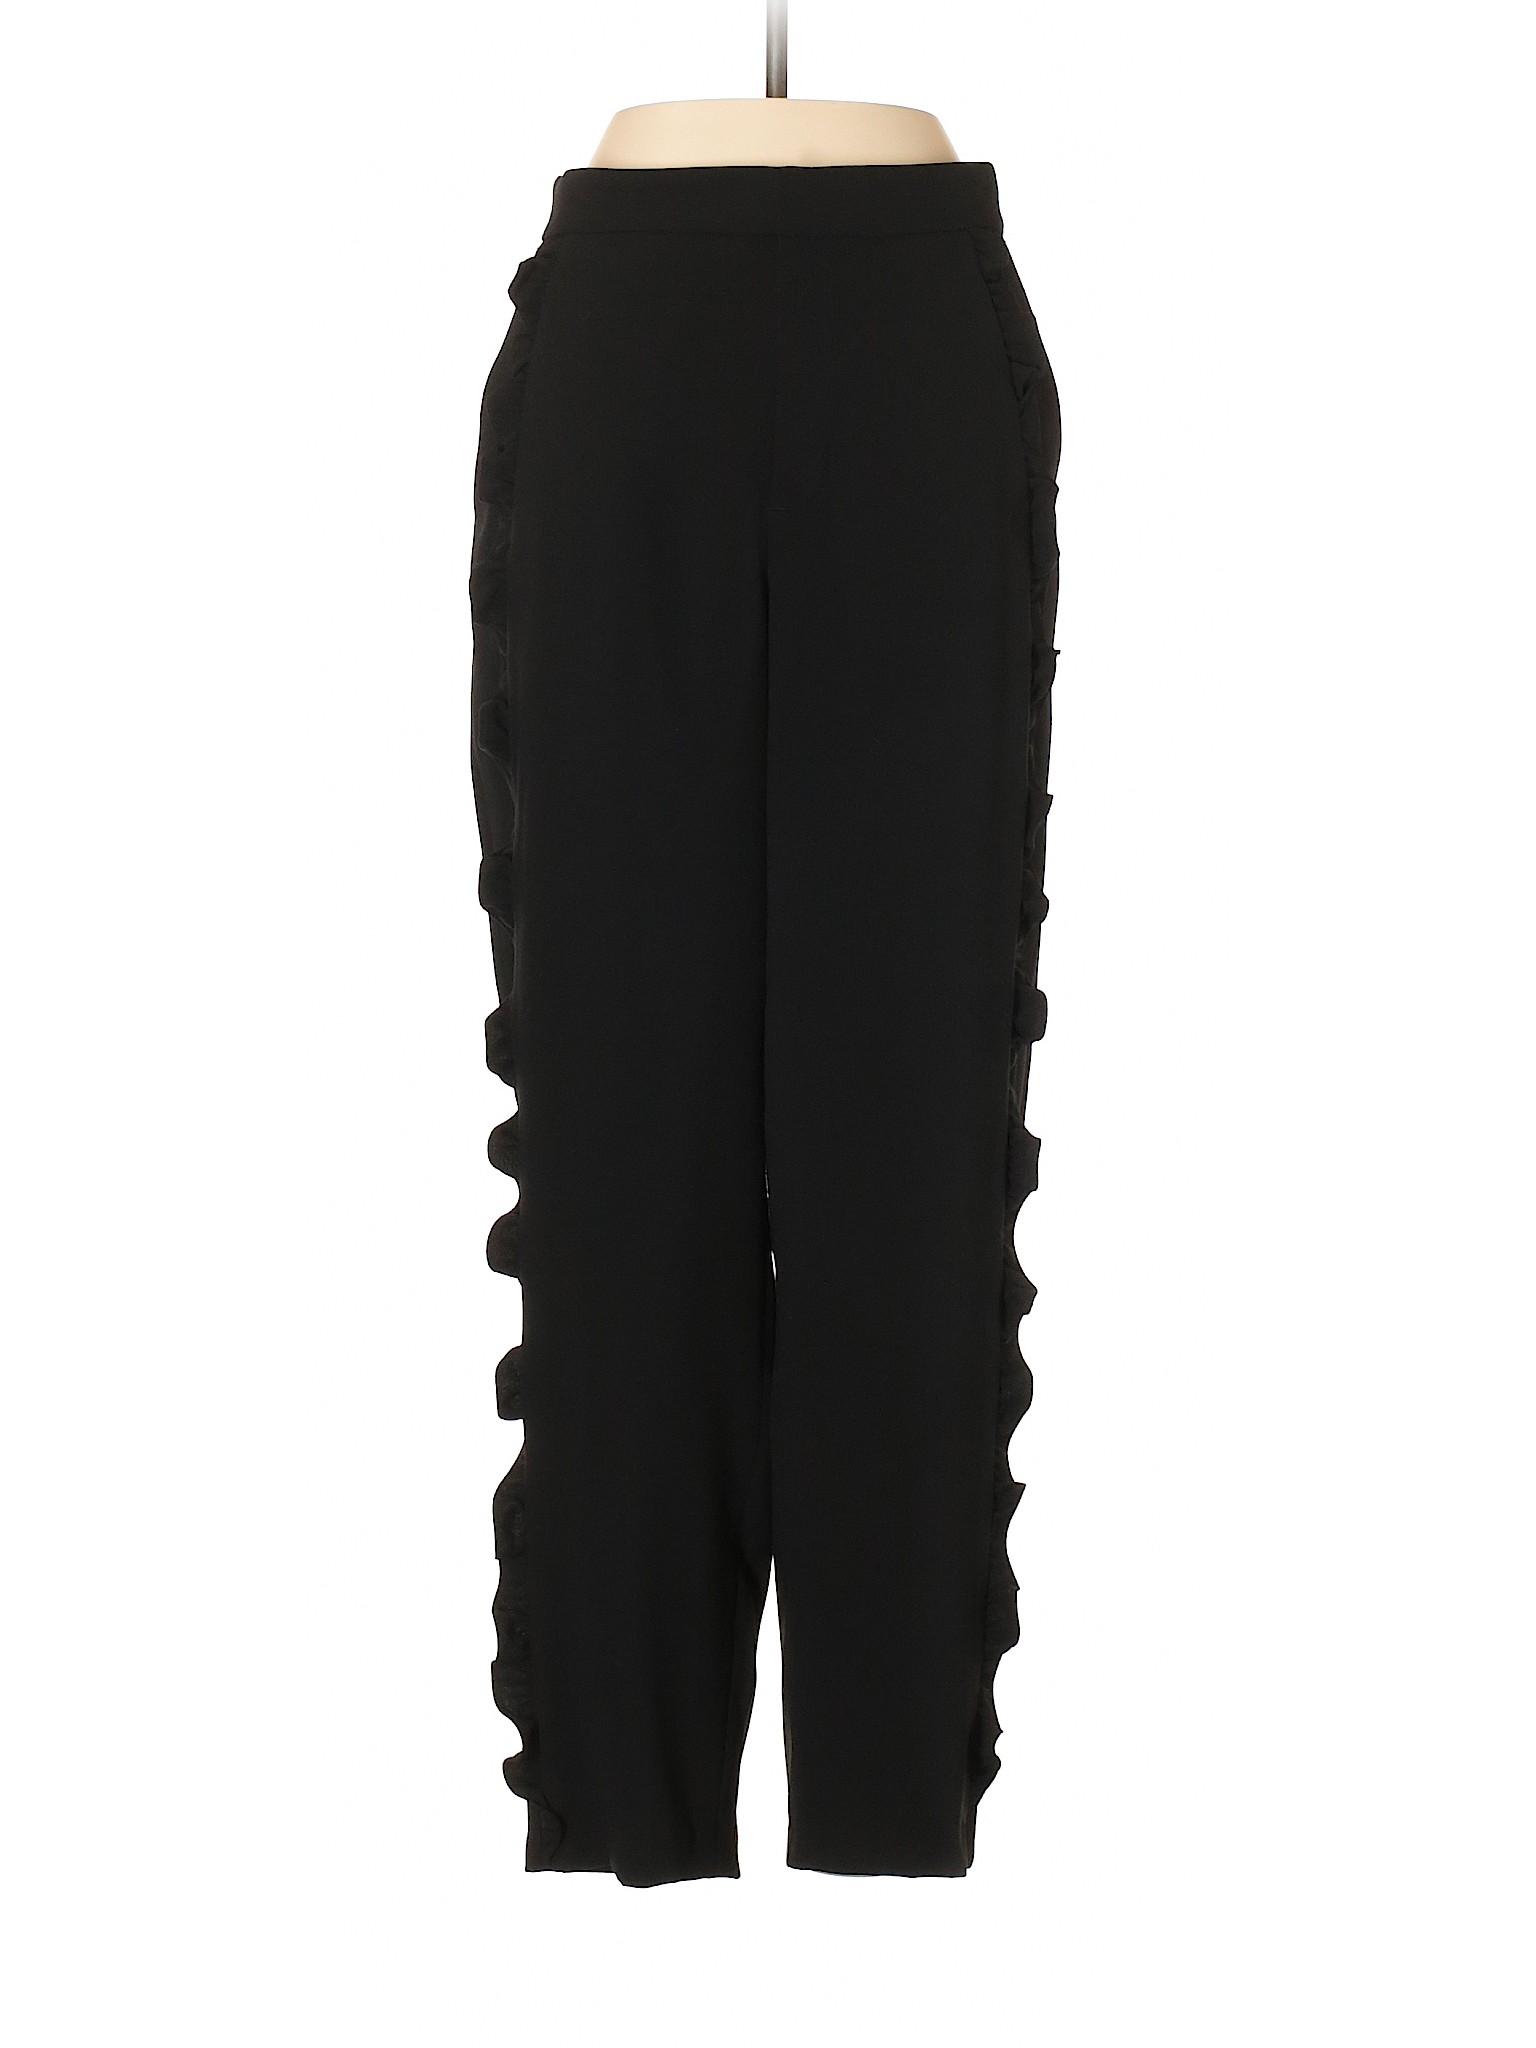 Boutique Winter Winter Zara Casual Casual Pants Boutique Zara r6r4w